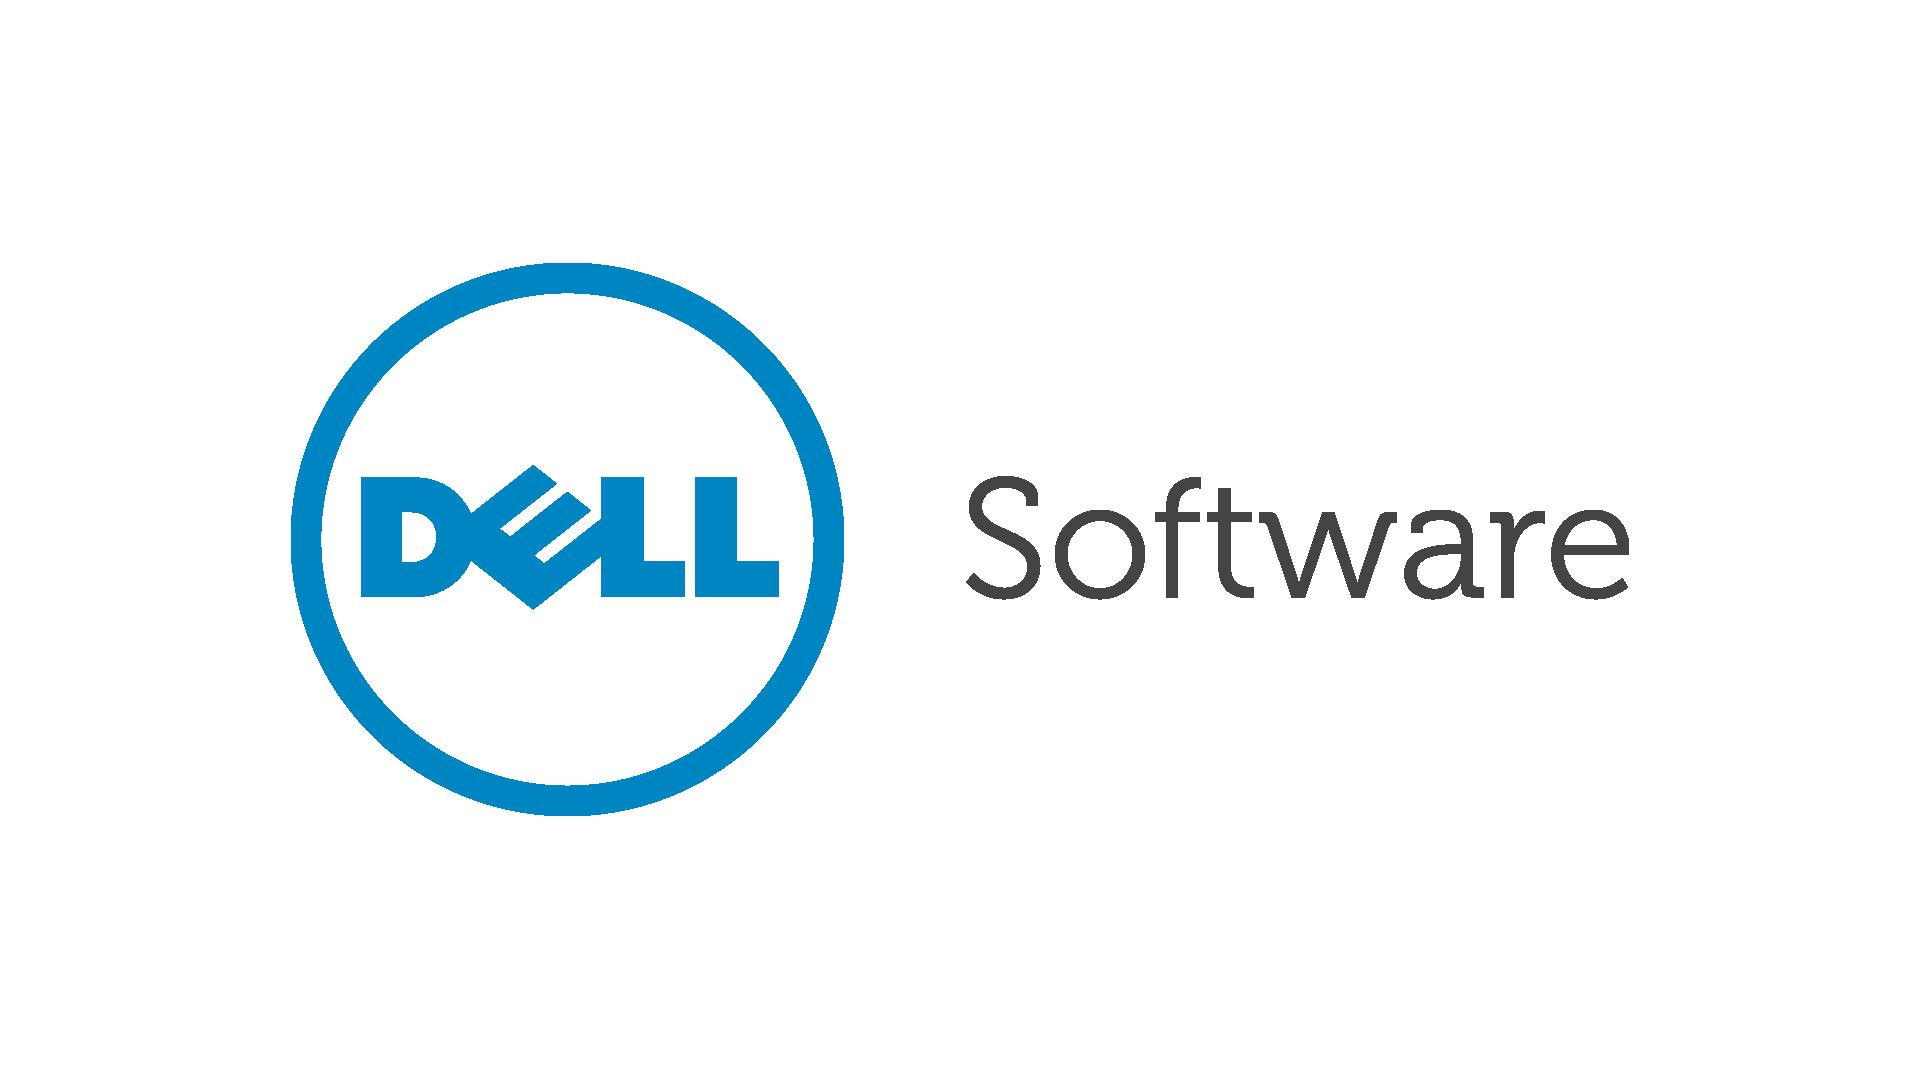 Dell Software_Blue